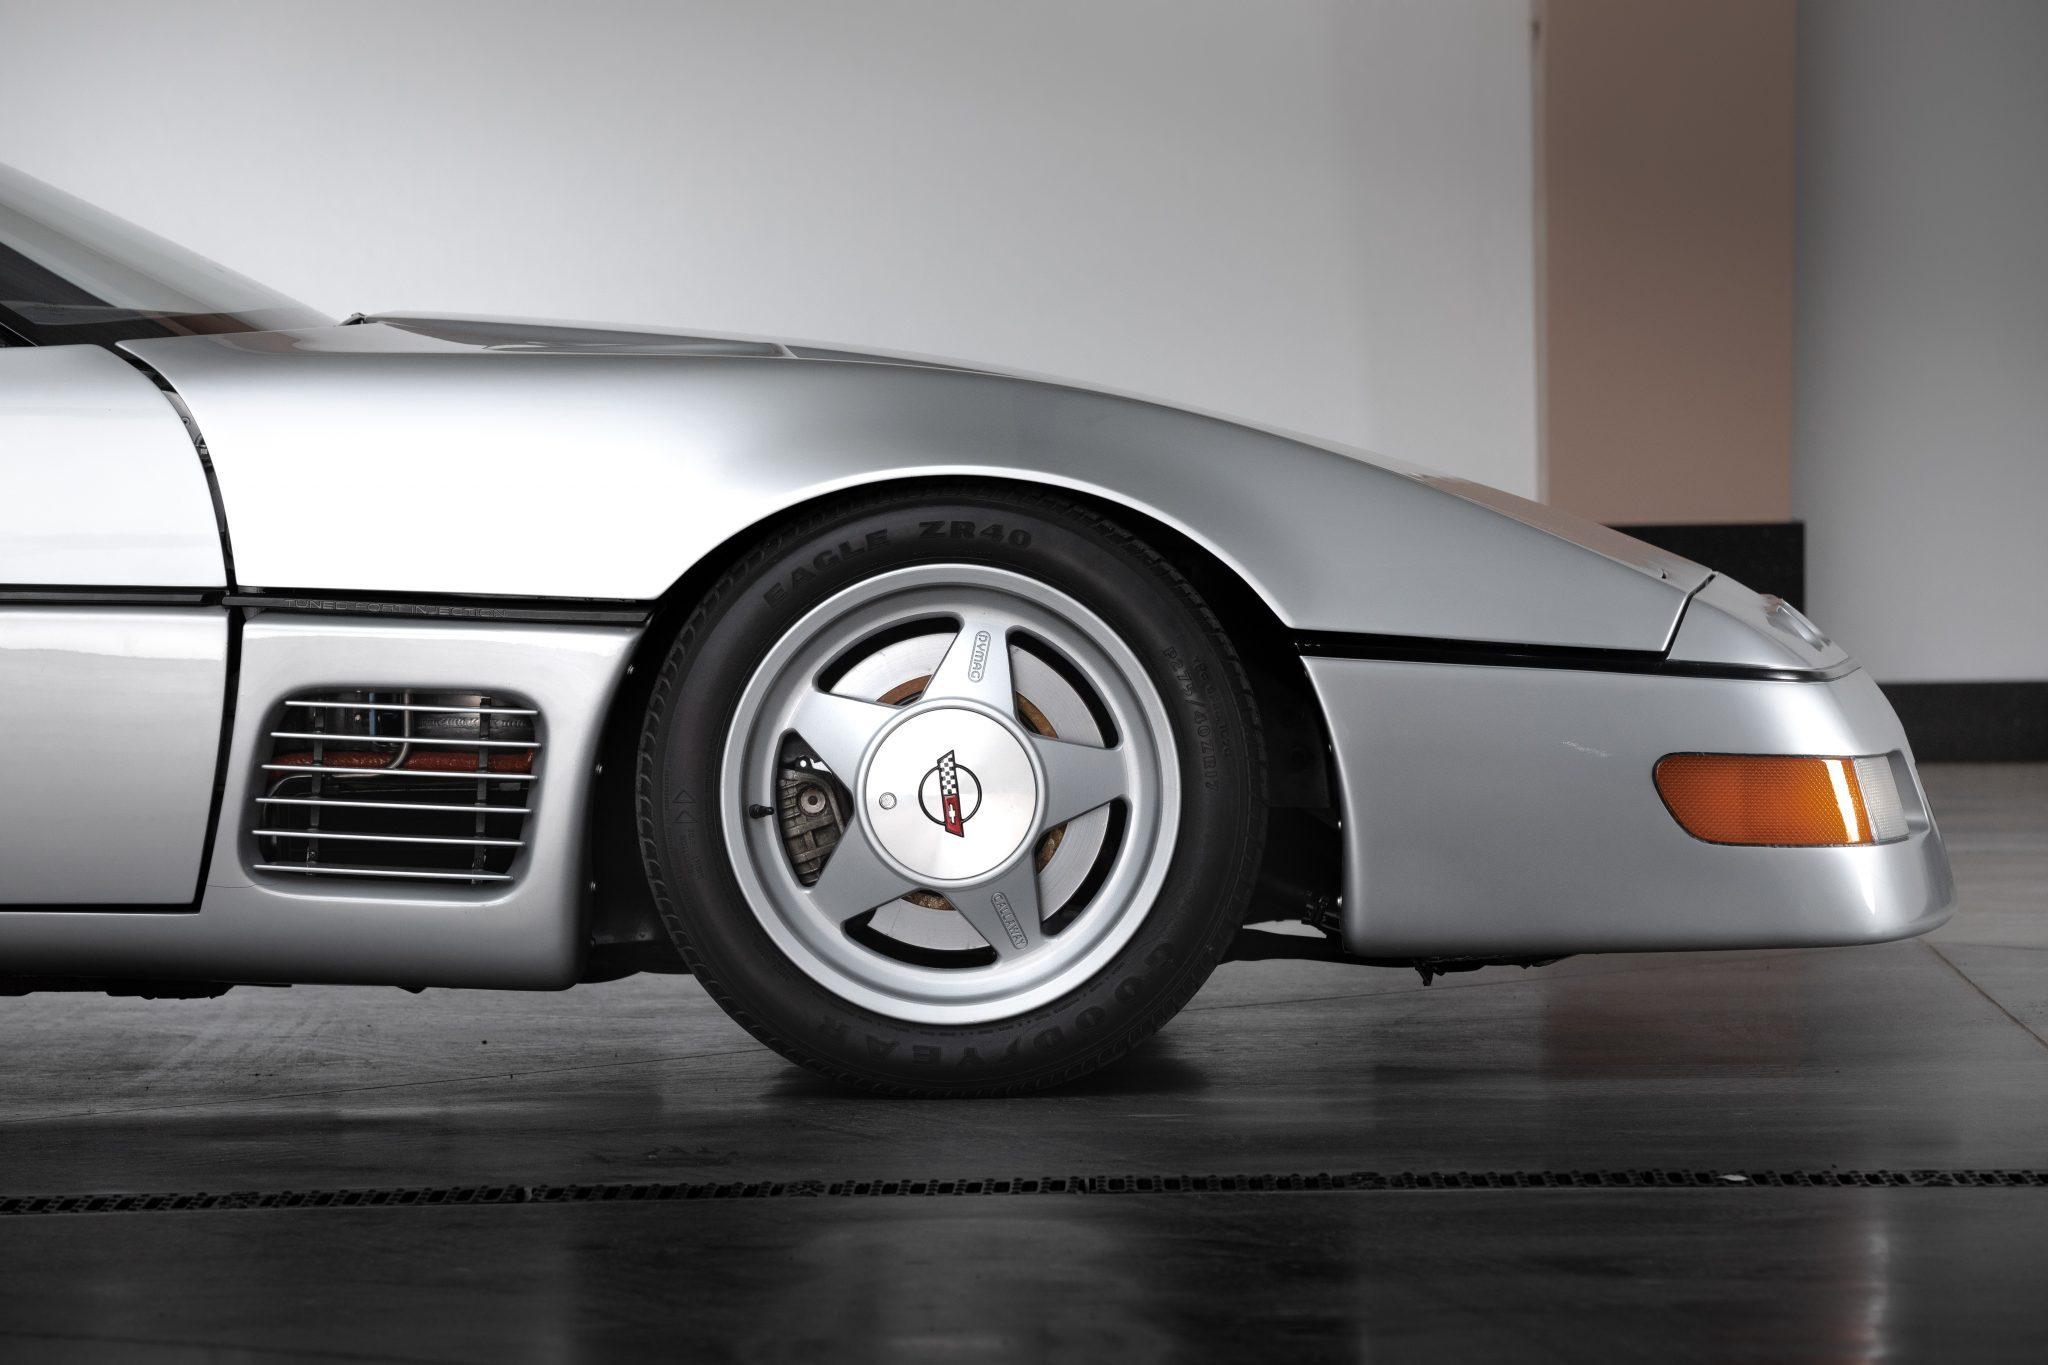 1988 Chevrolet Corvette Callaway SledgeHammer BaT front profile